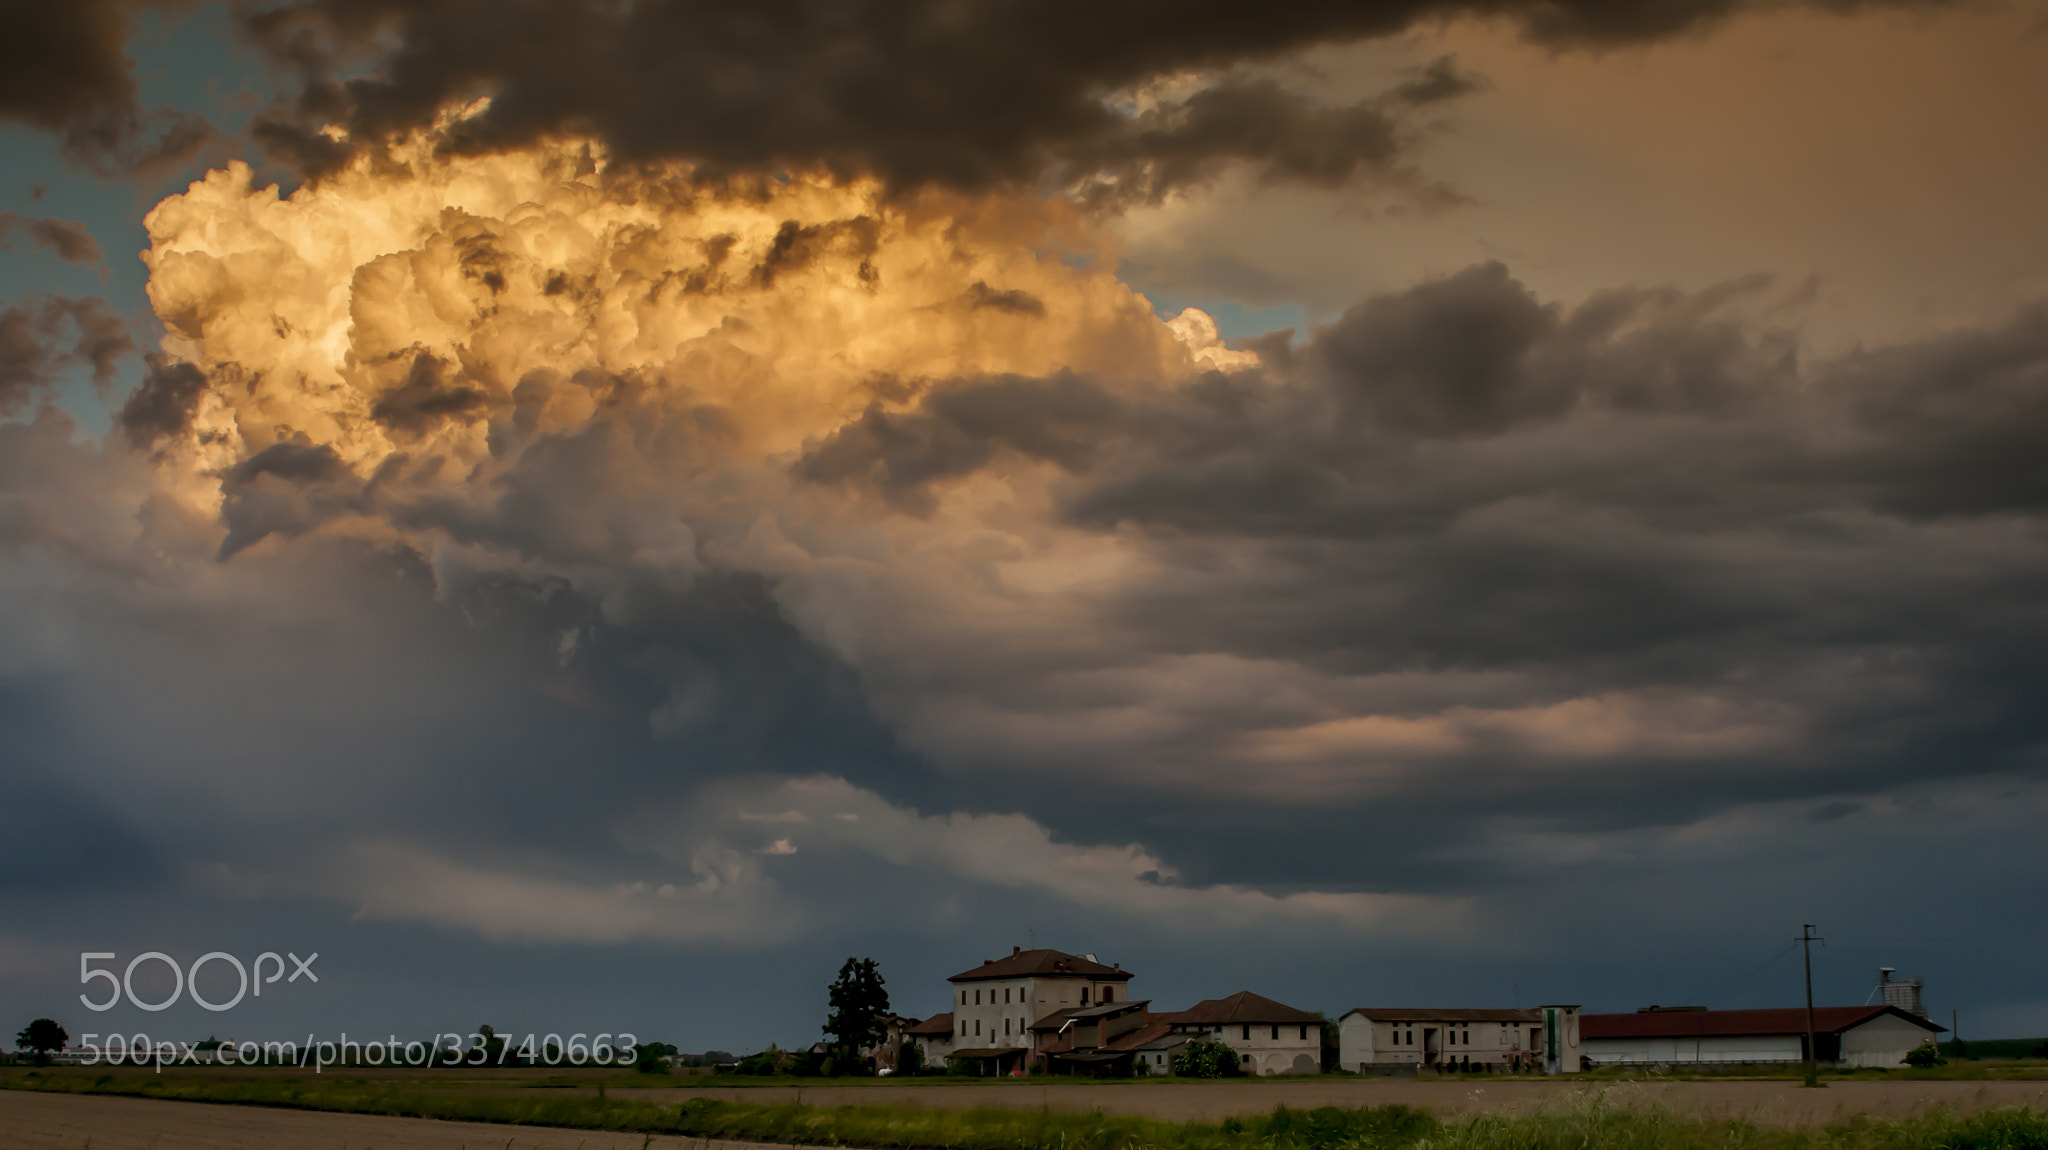 Photograph sunset by Riccardo Trevisani on 500px